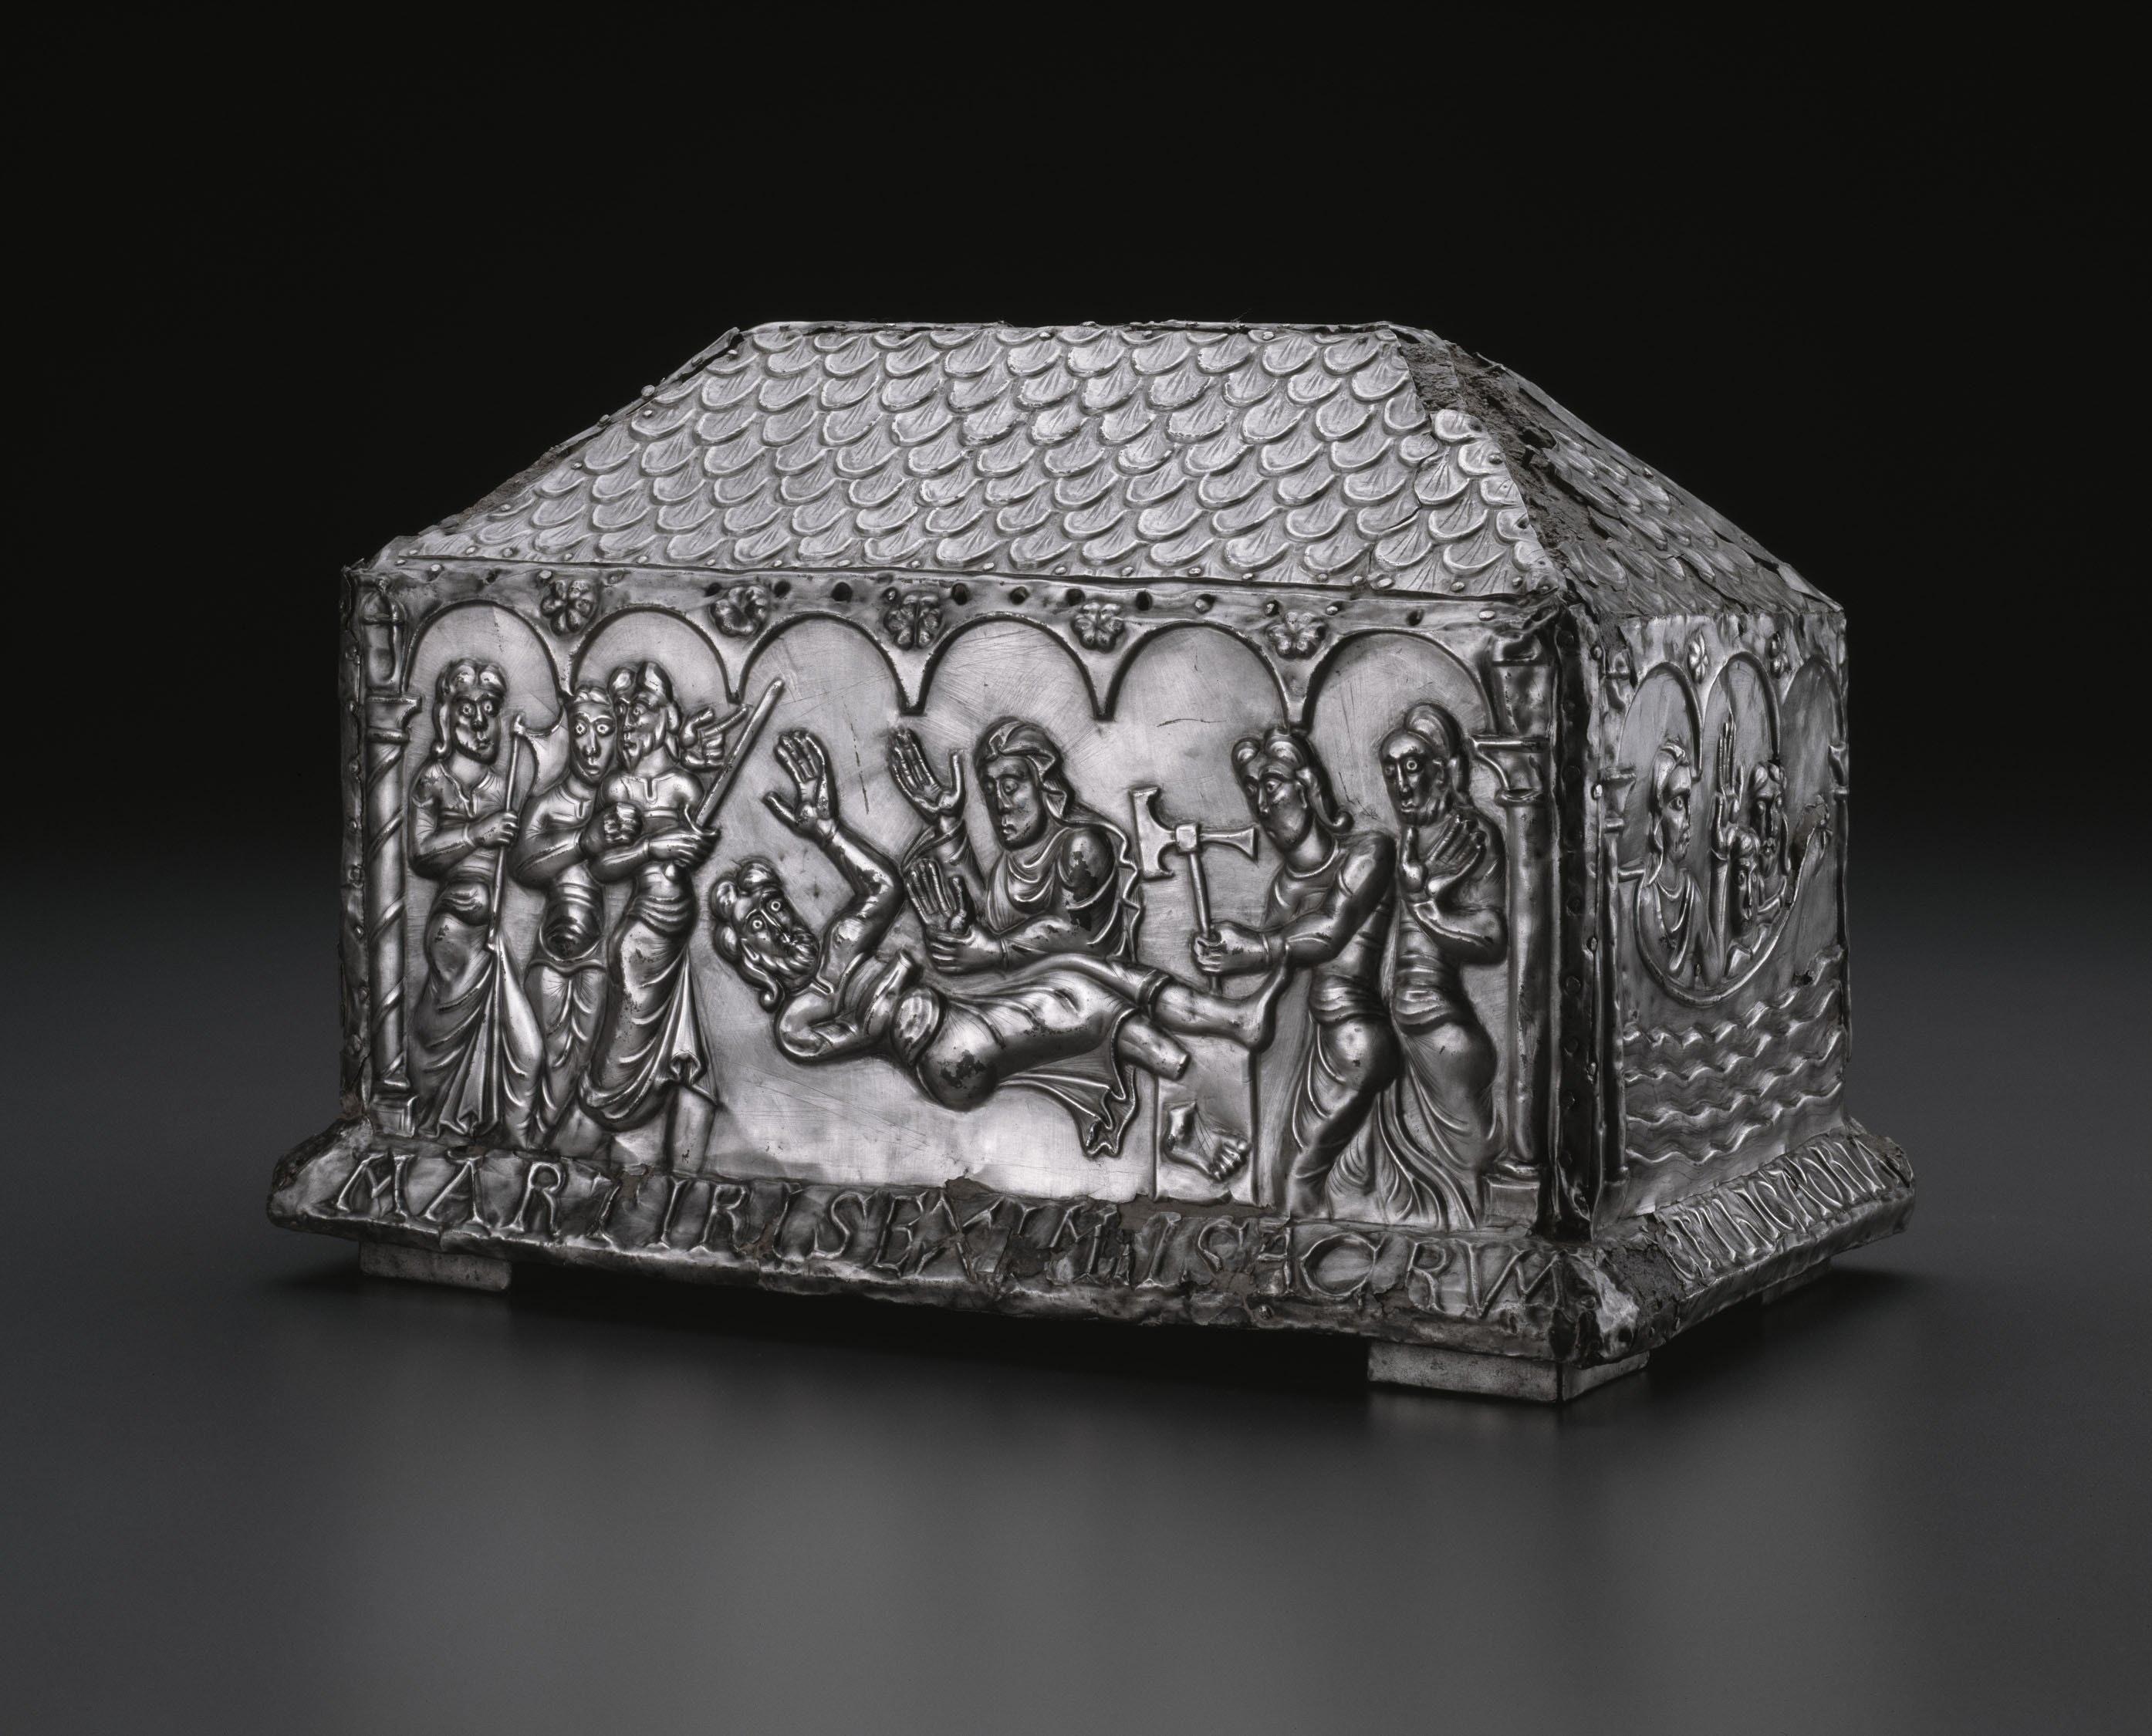 1943.65 Leon Spainish Reliquary Casket Of Saints Adrian And Natalia